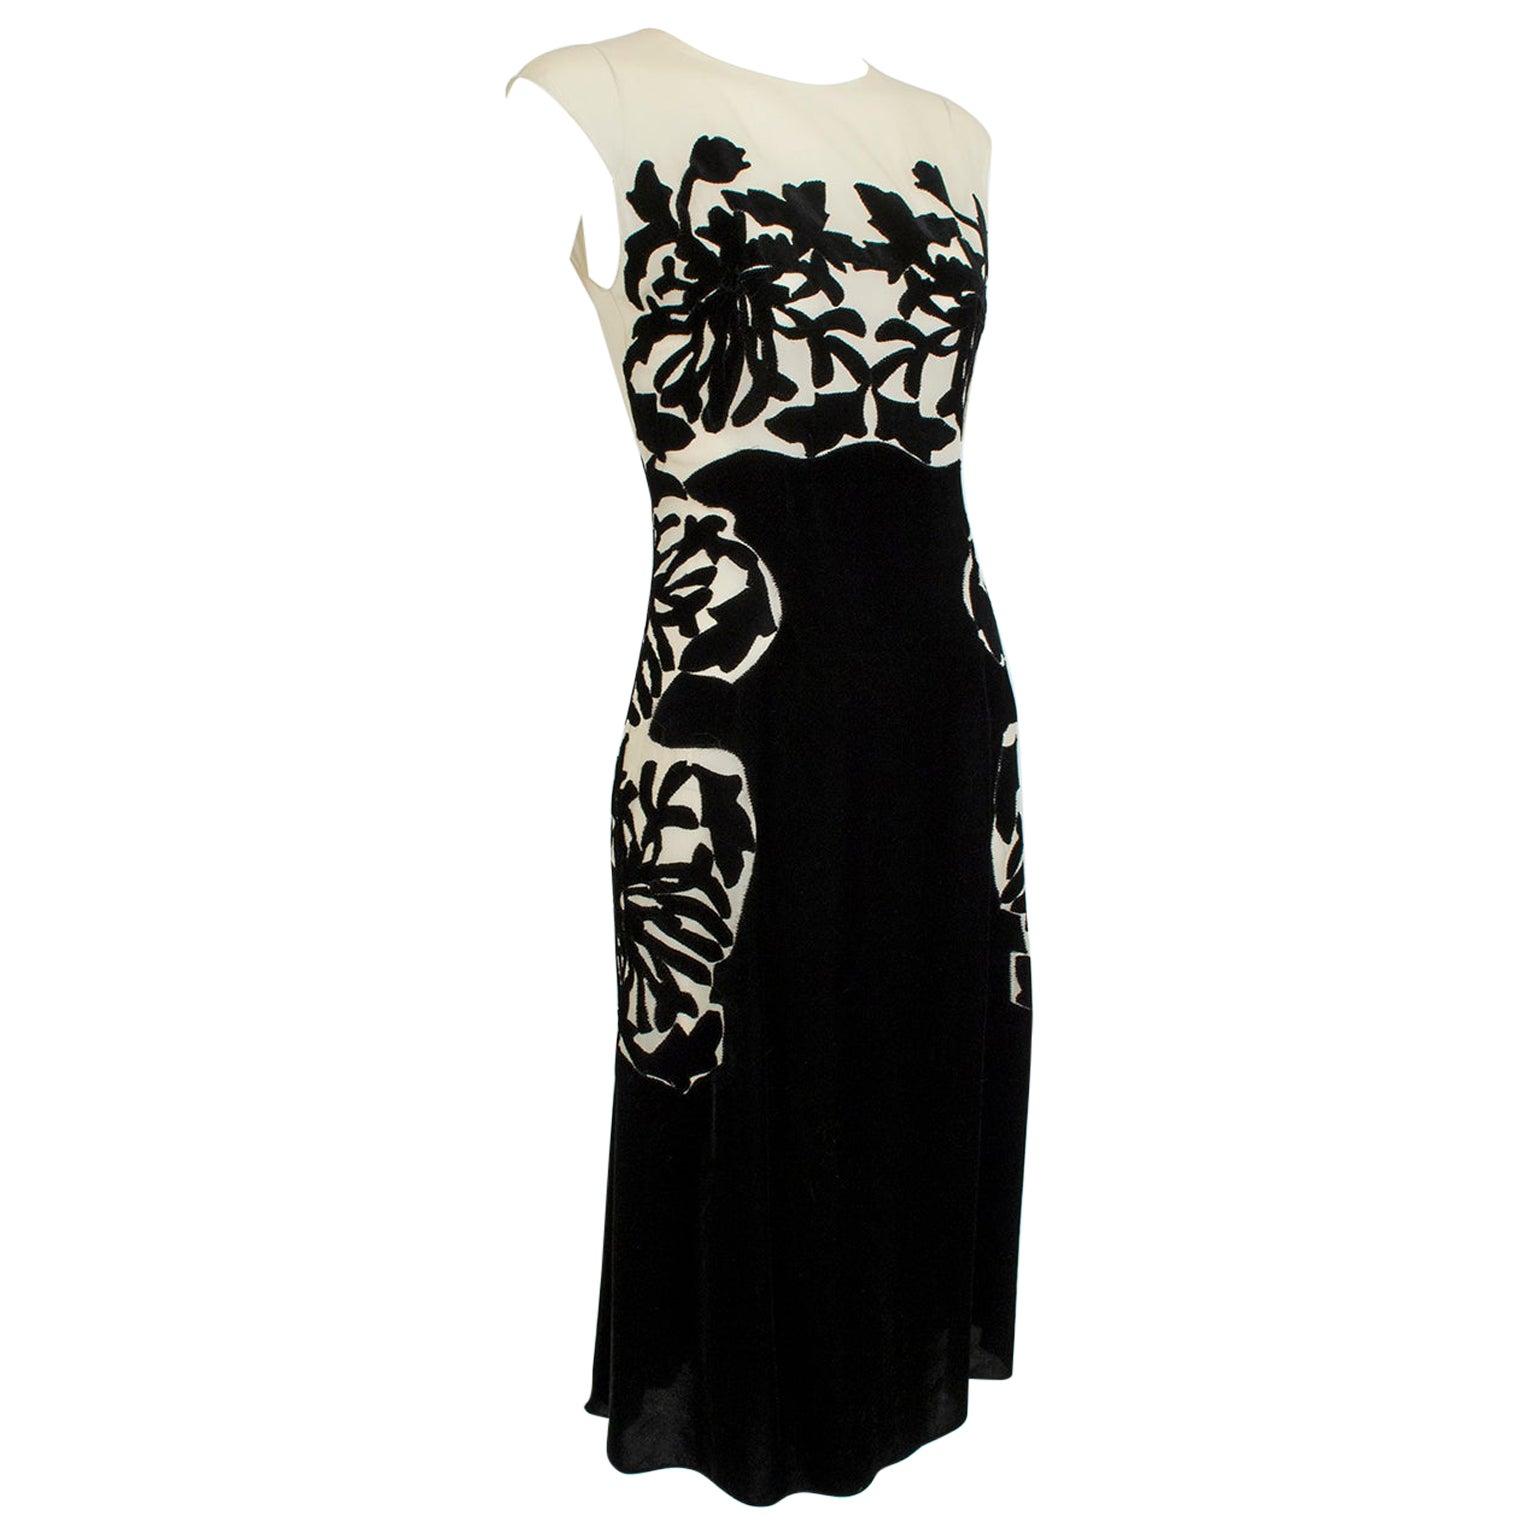 New Bottega Veneta Black Silk Velvet Branch Coral Illusion Runway Dress – It. 38